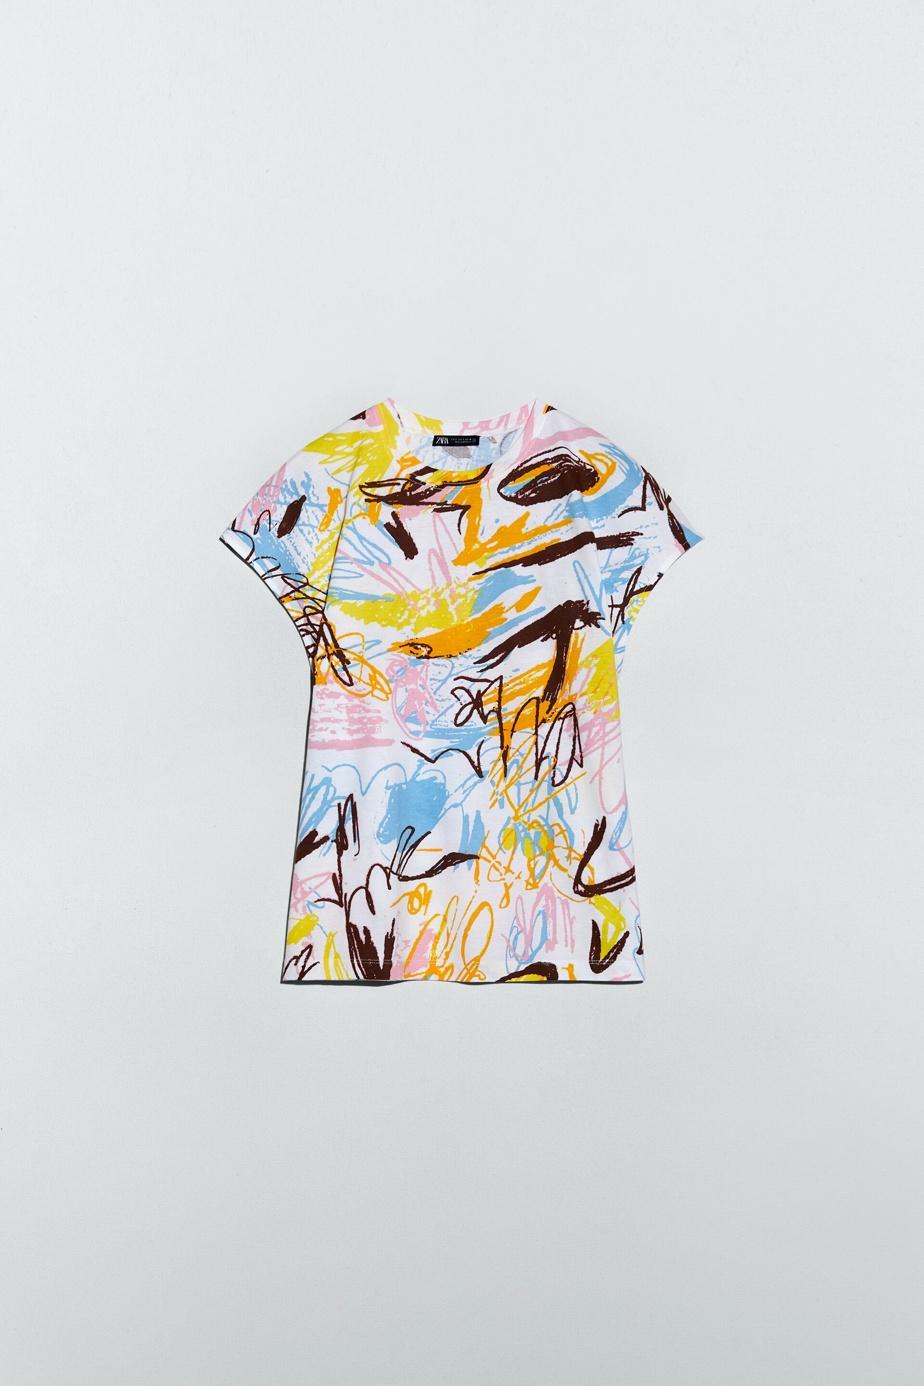 T-shirt graffiti noir et blanc, Zara, 19,90$